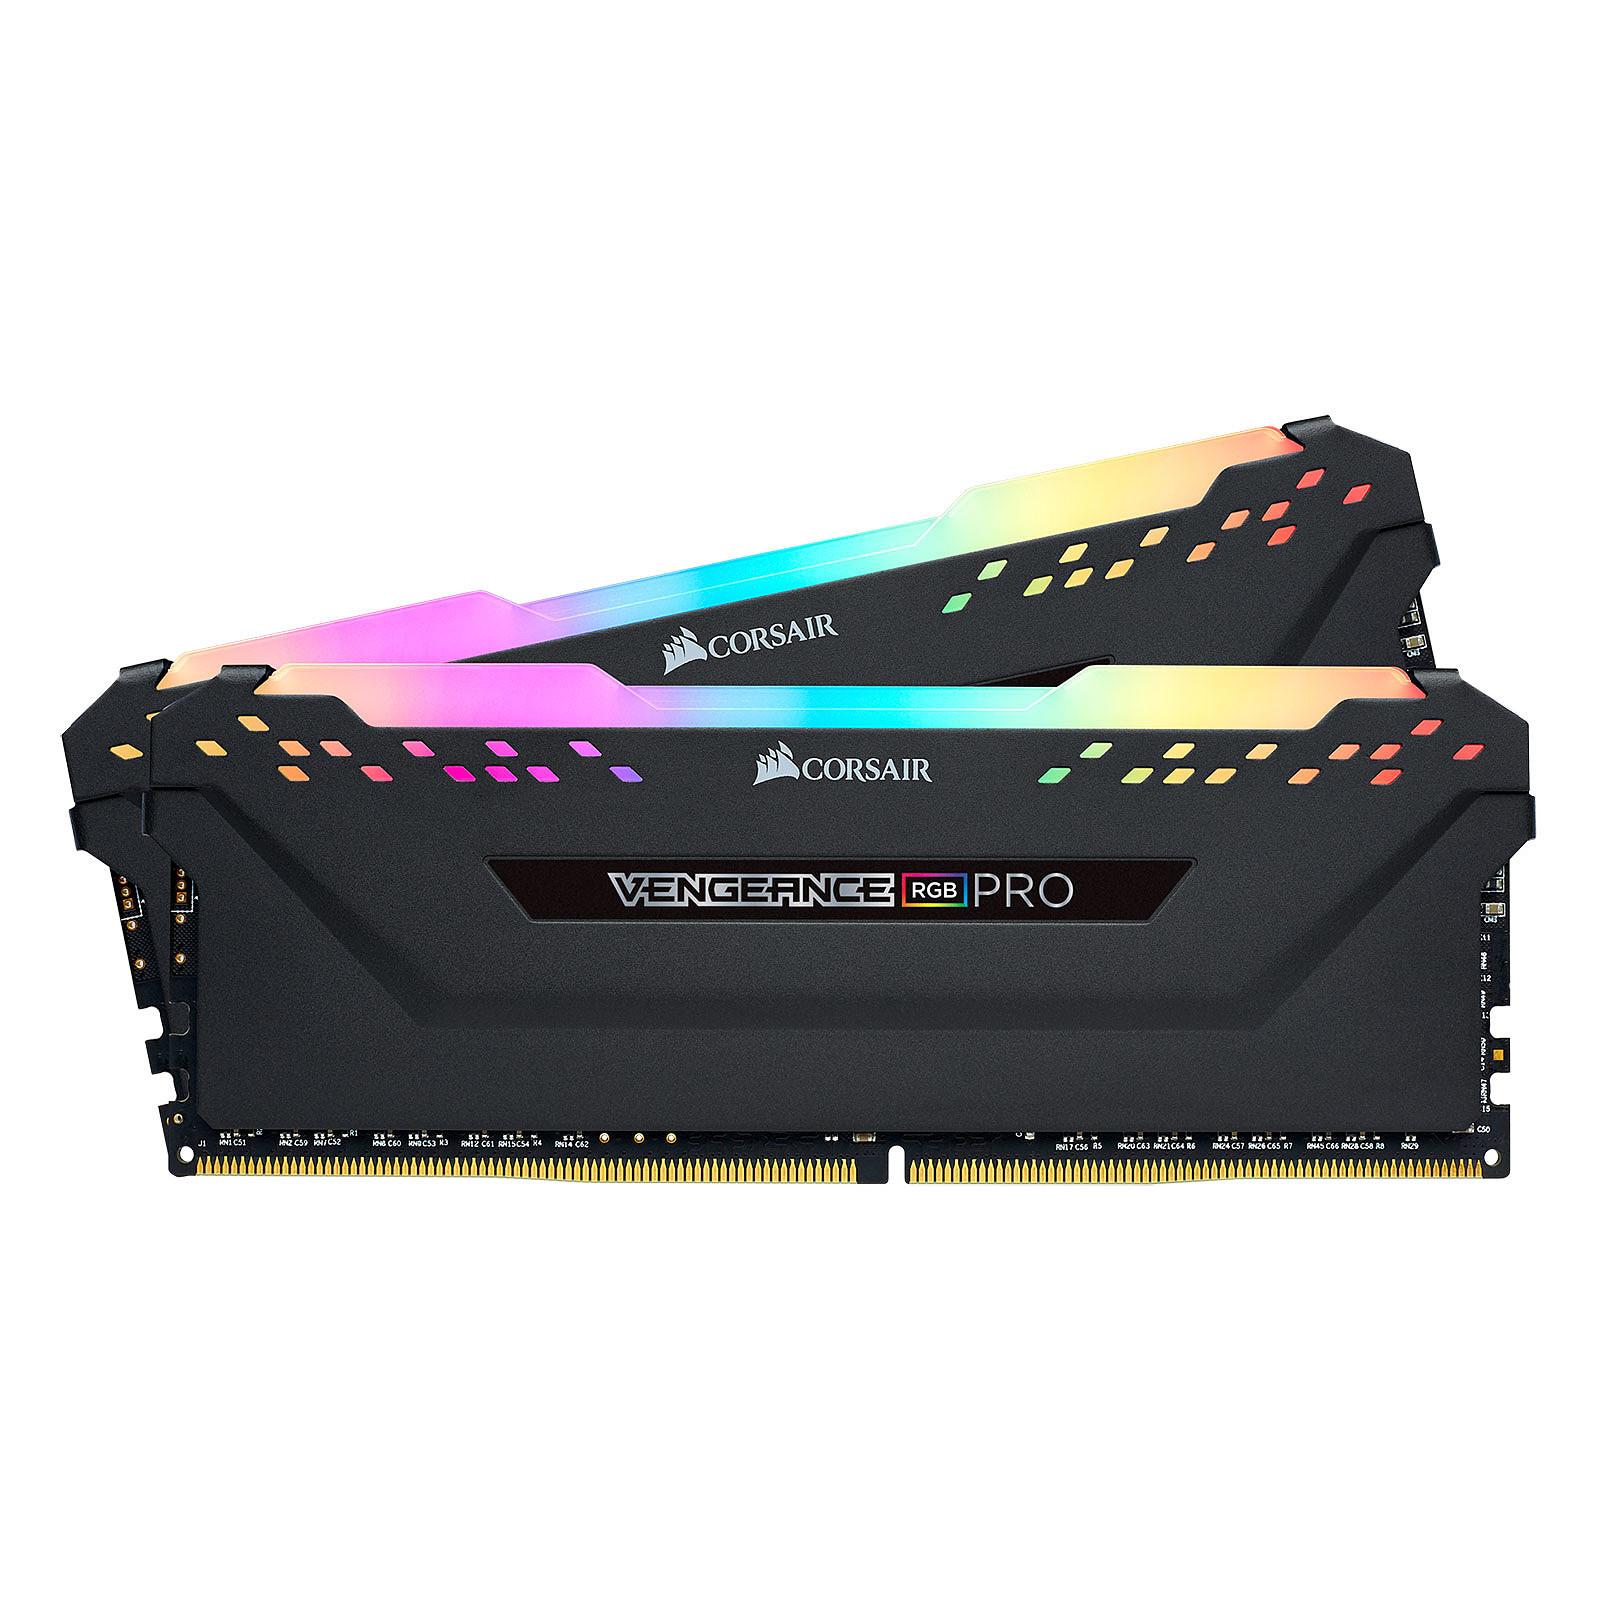 Kit de RAM Vengeance RGB Pro Series DDR4 3200 MHz 2 x 8 Go TUF Gaming